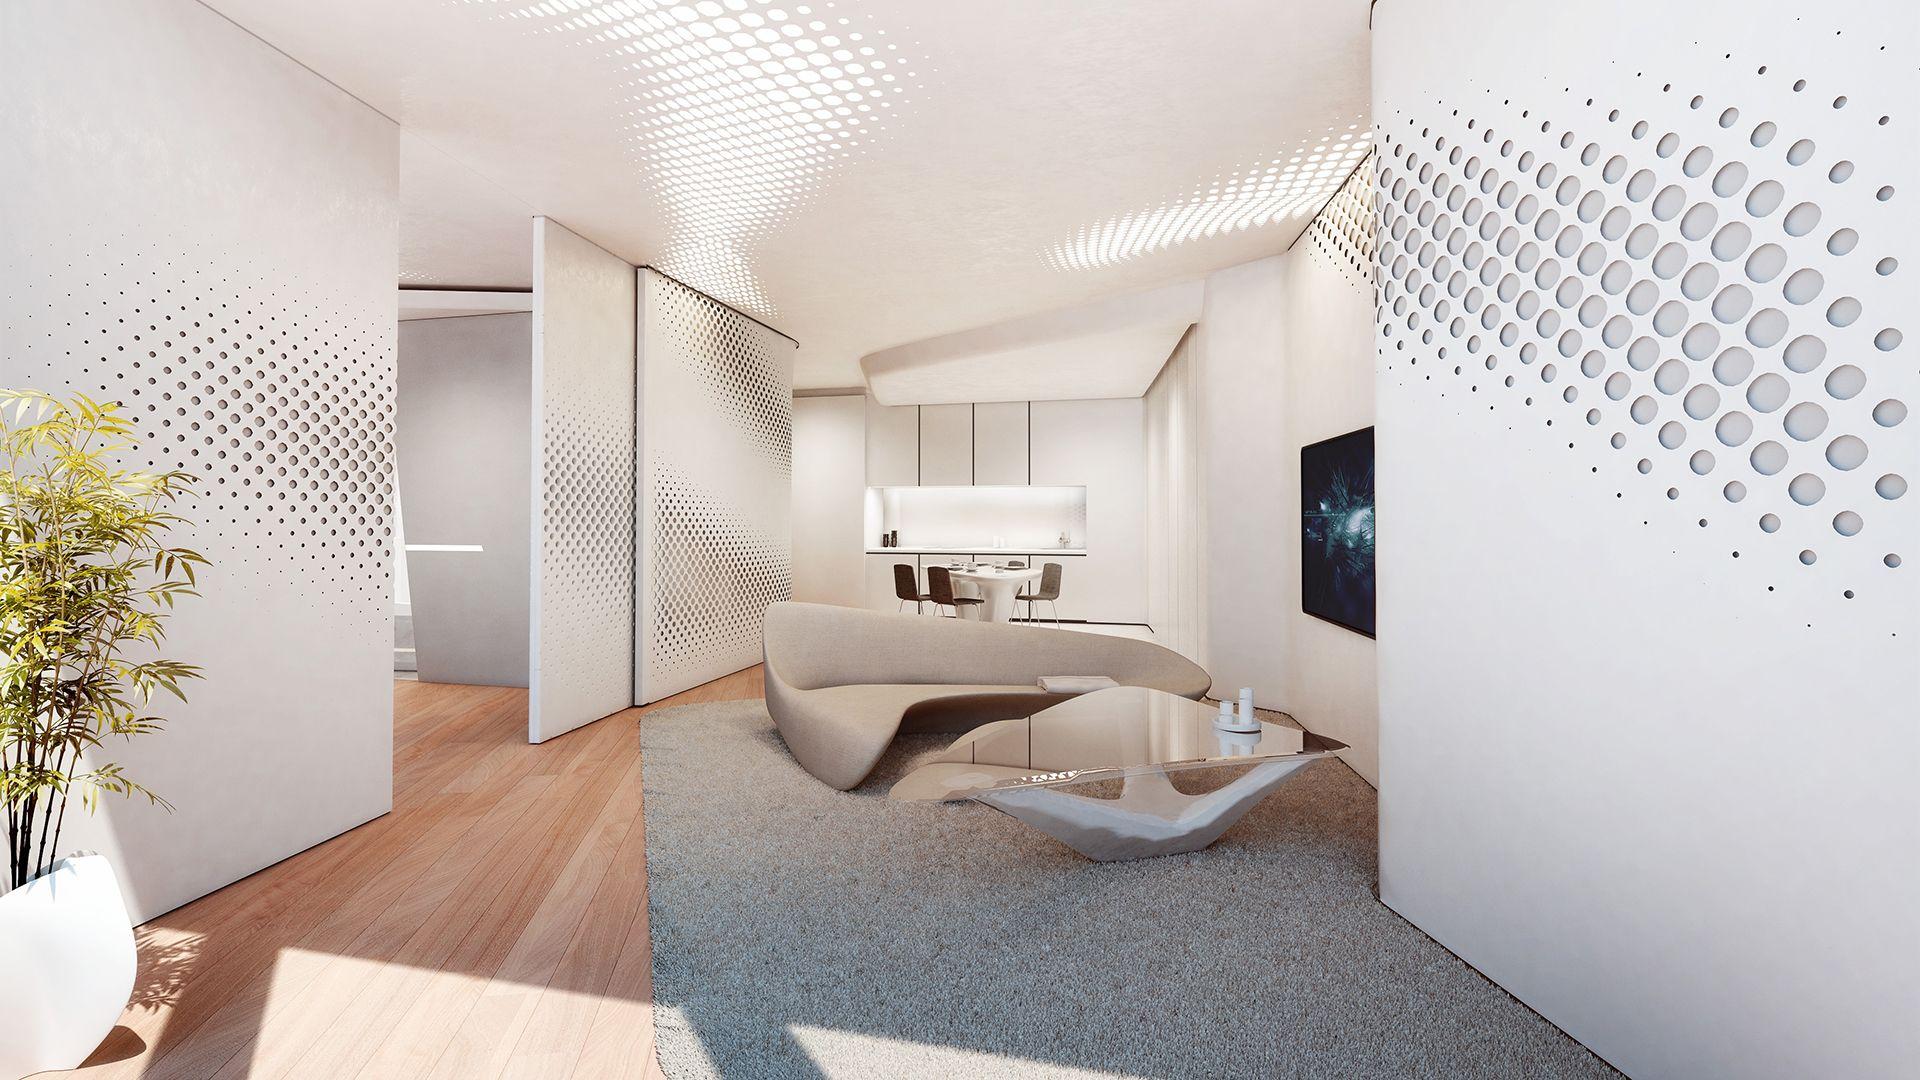 See Inside Dubai\'s Opus Office Towers, Where Zaha Hadid Designed Her ...